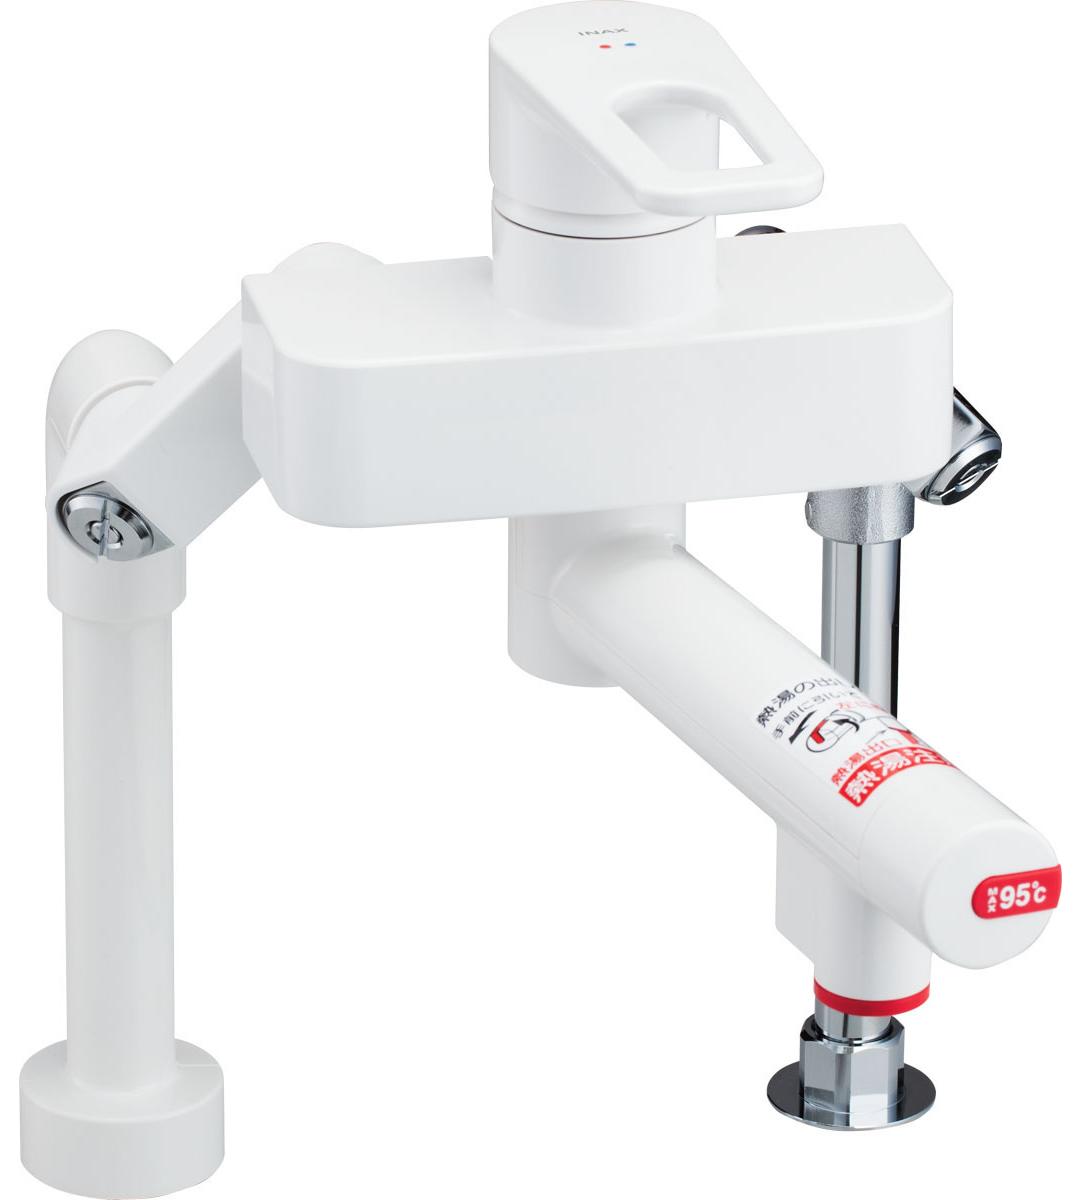 INAX[イナックス]・LIXIL[リクシル] 【SF-WCH350】 電気温水器専用水栓金具 熱湯用水栓 熱湯口付シングルレバー混合水栓(台付ツーホールタイプ) [新品]